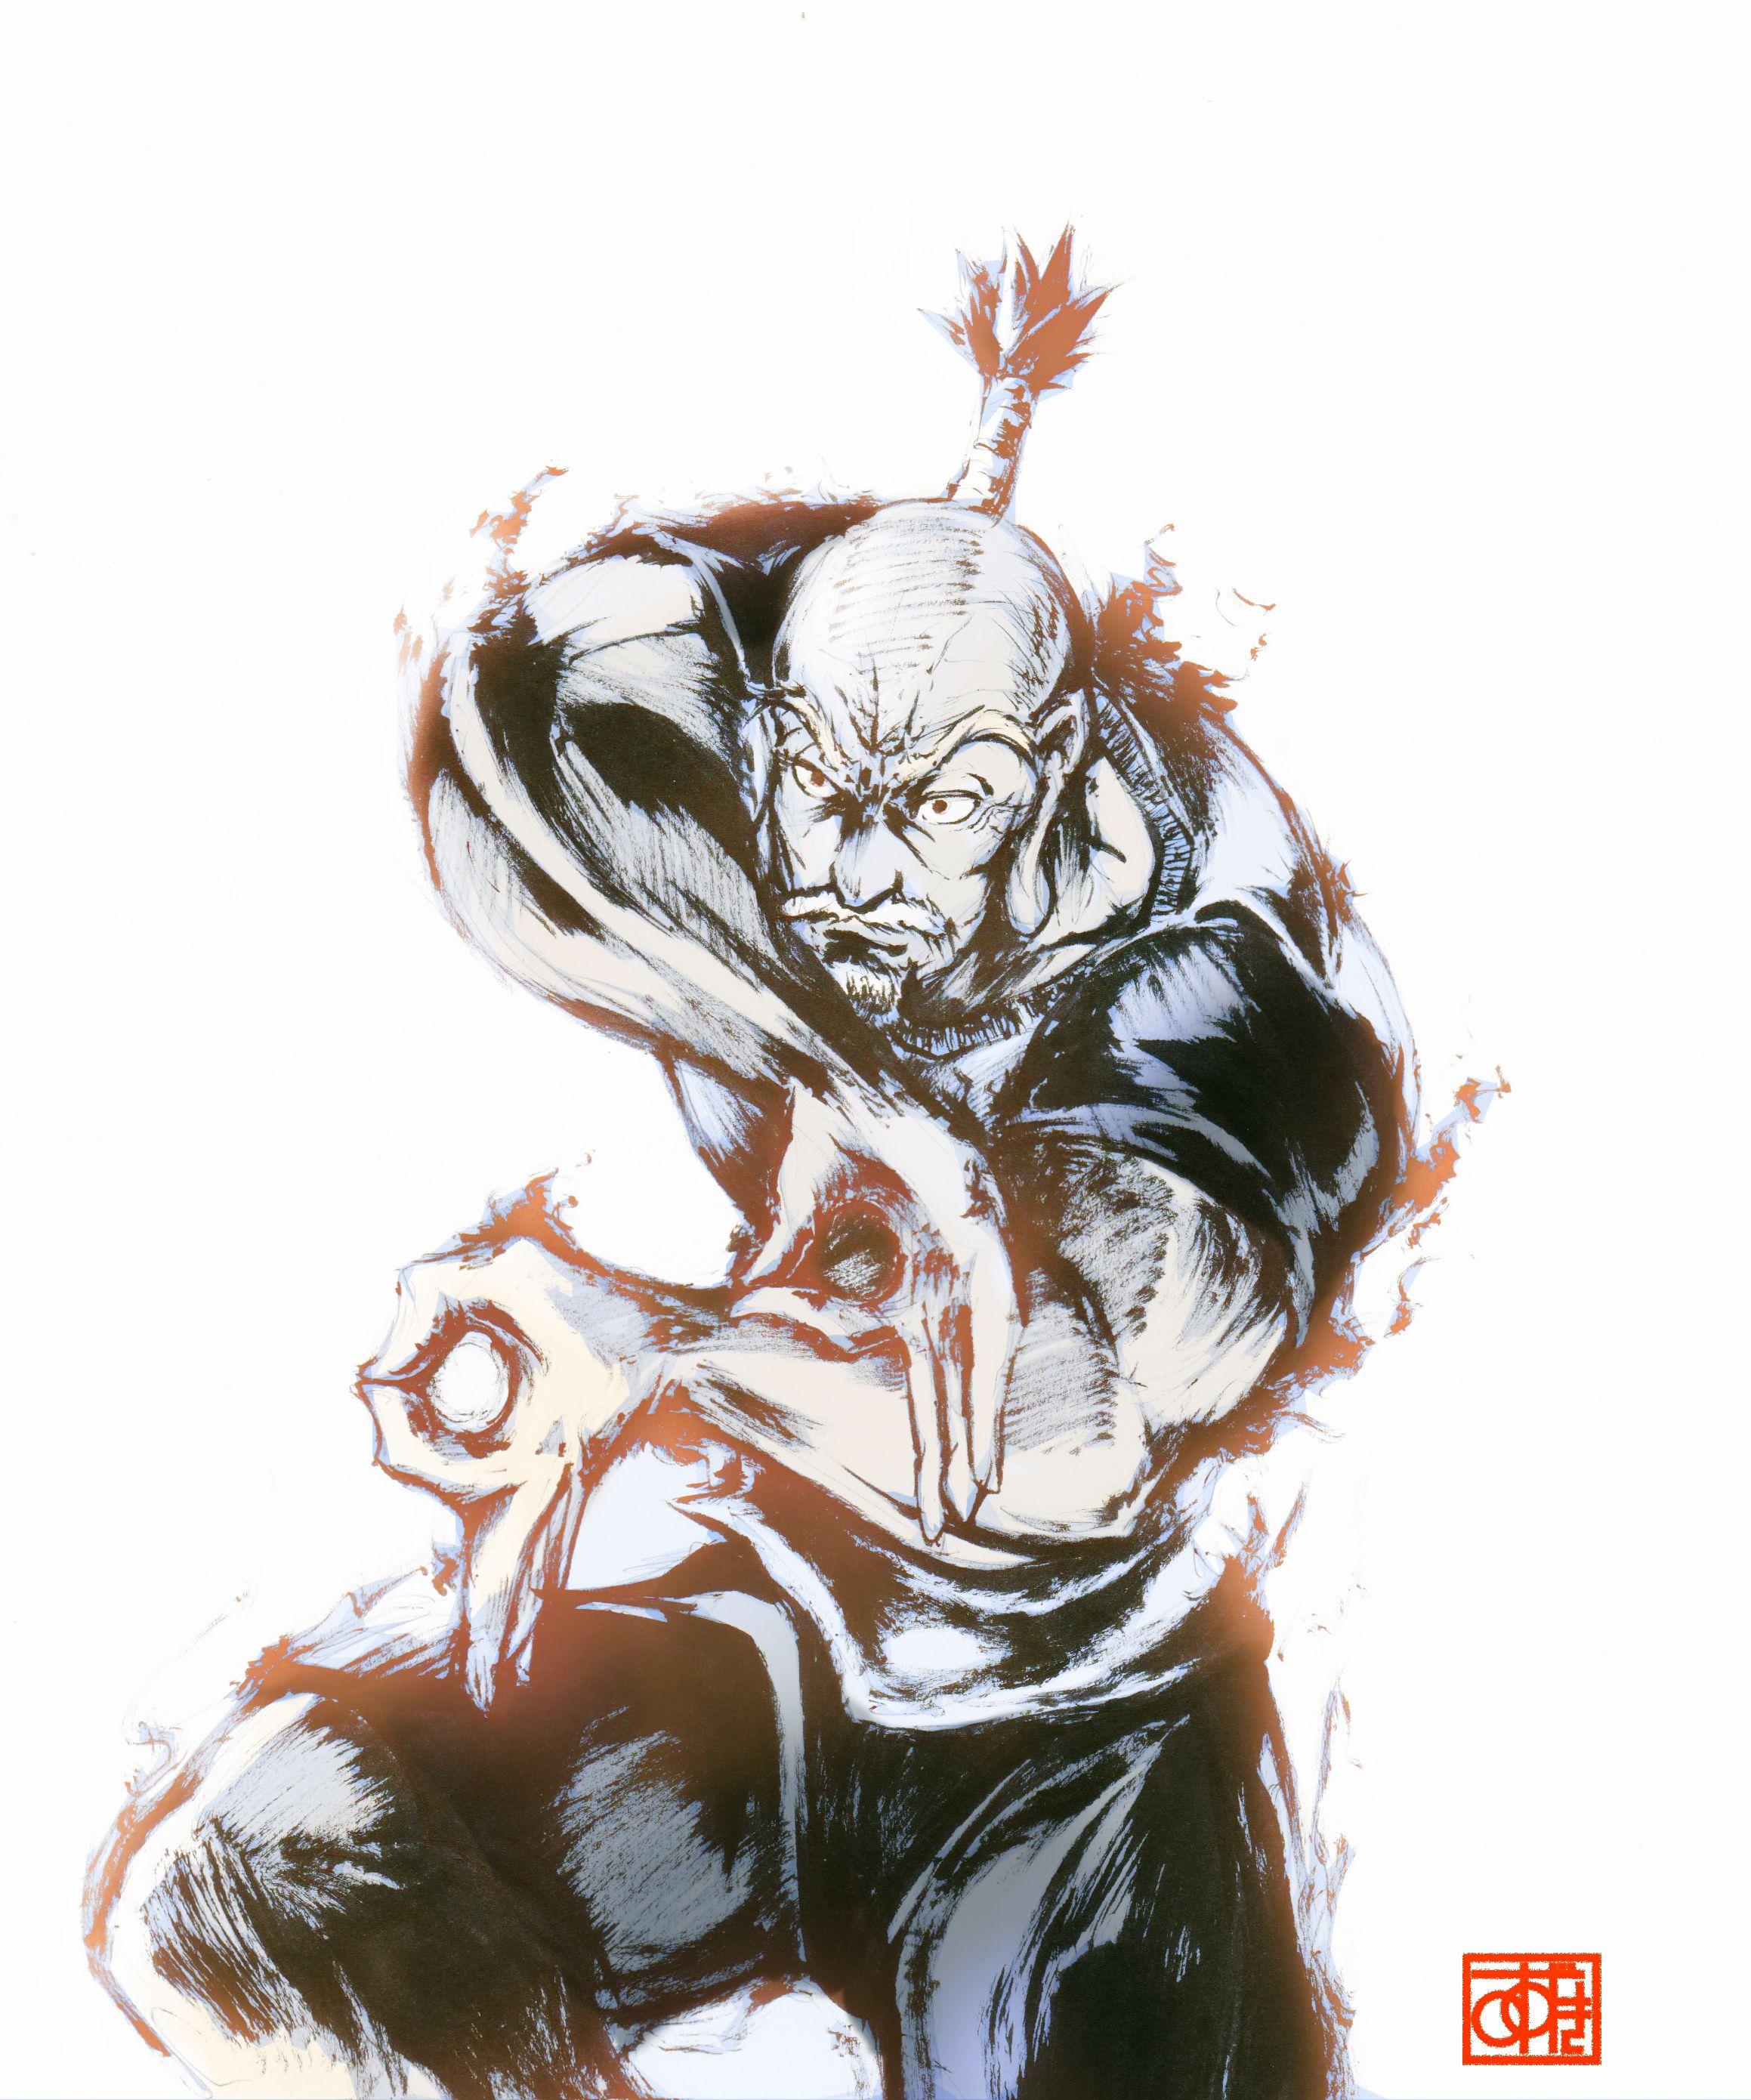 Isaac Netero Hunter X Hunter Personagens De Anime Anime Arte Anime